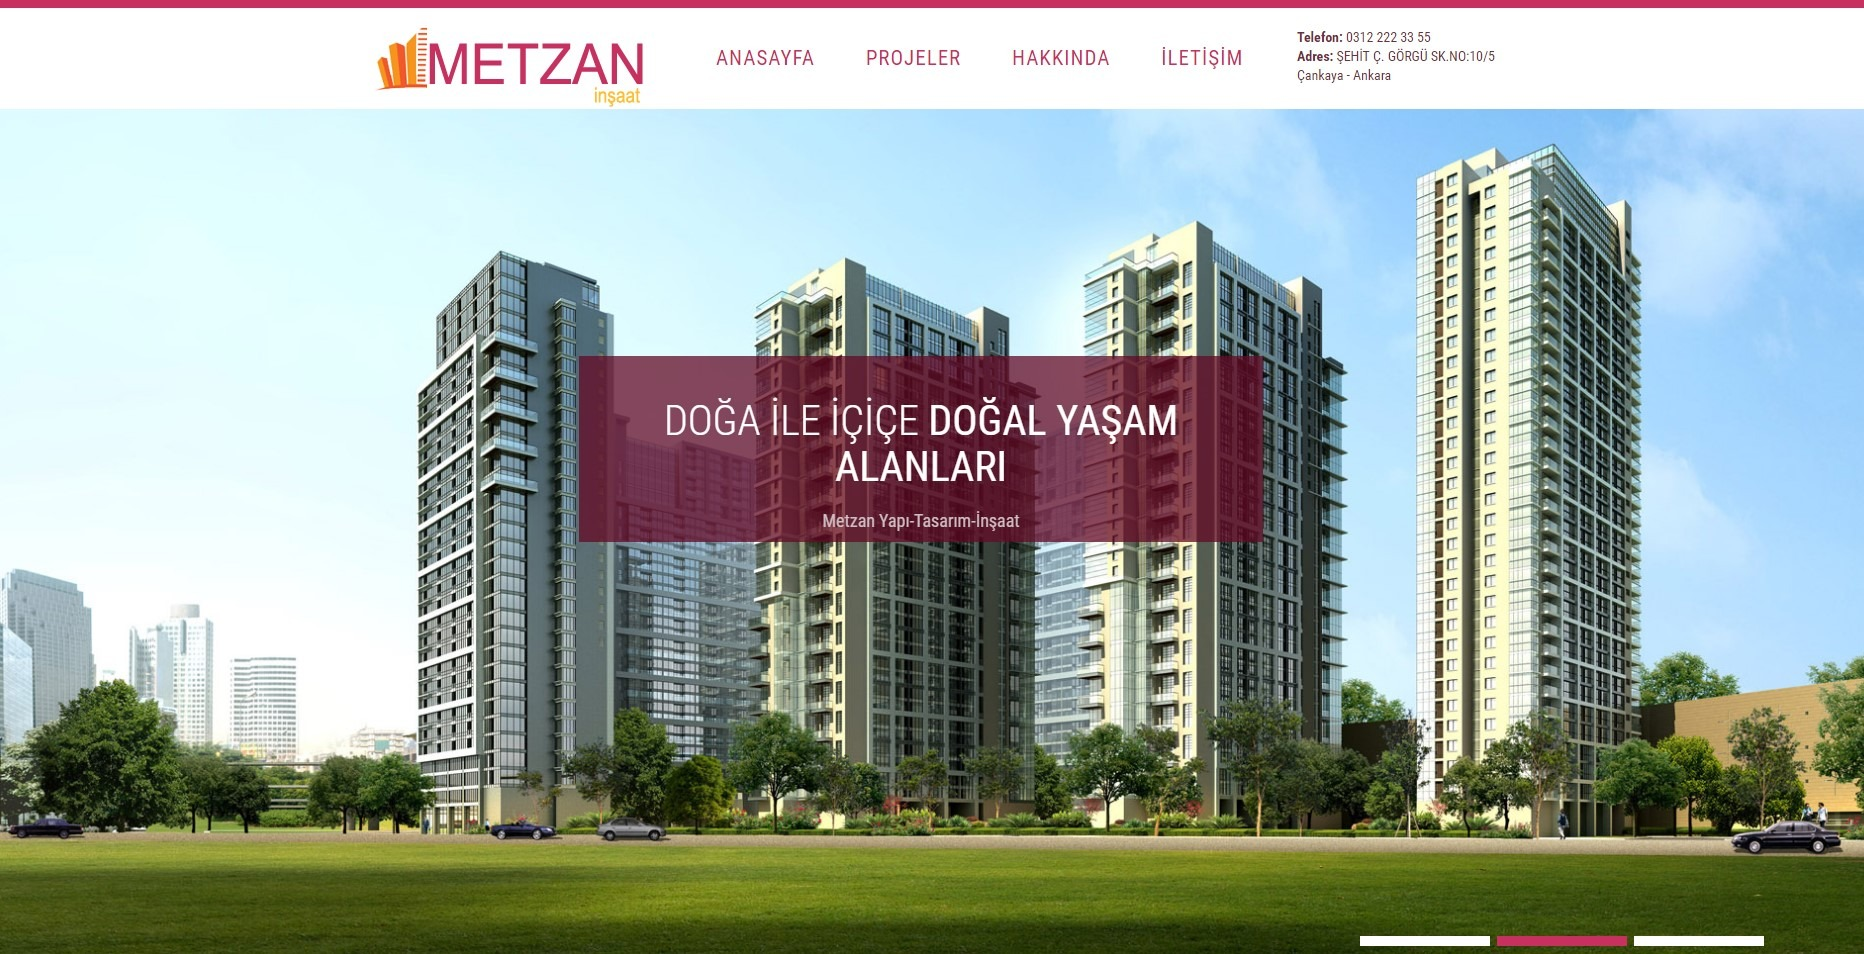 metzan.com